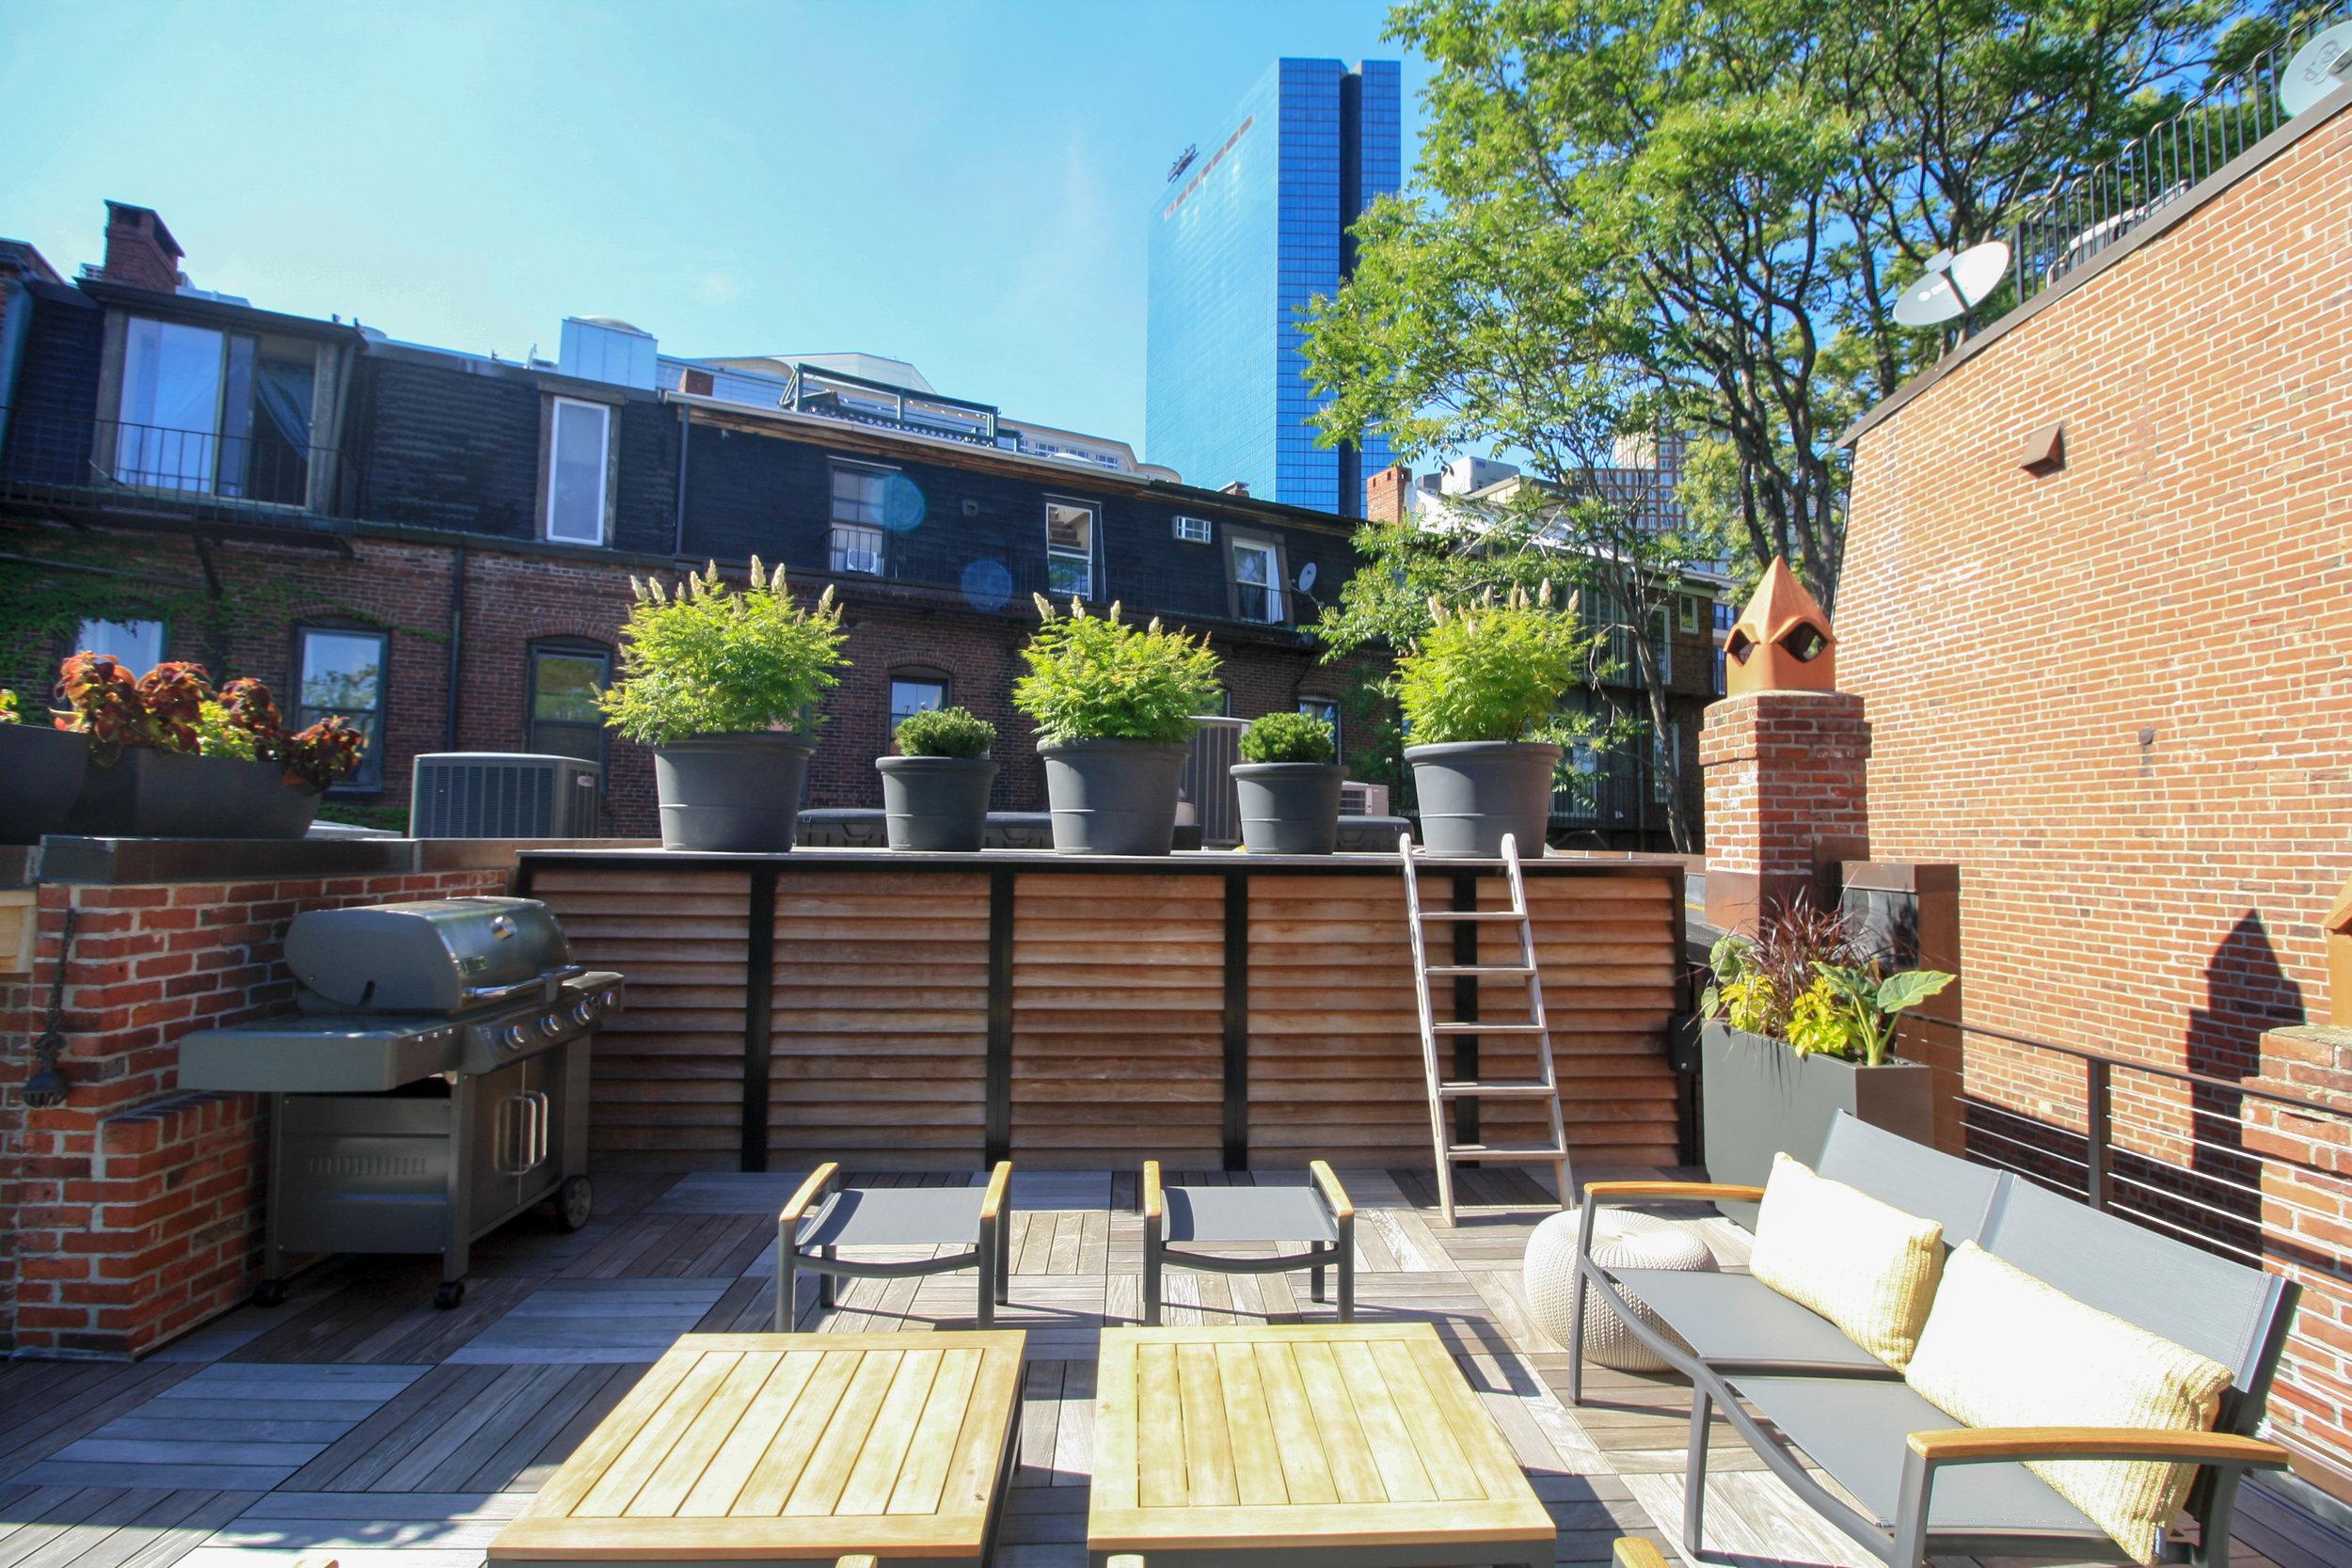 recover-residential-roof-deck-boston-20180628-20.jpg